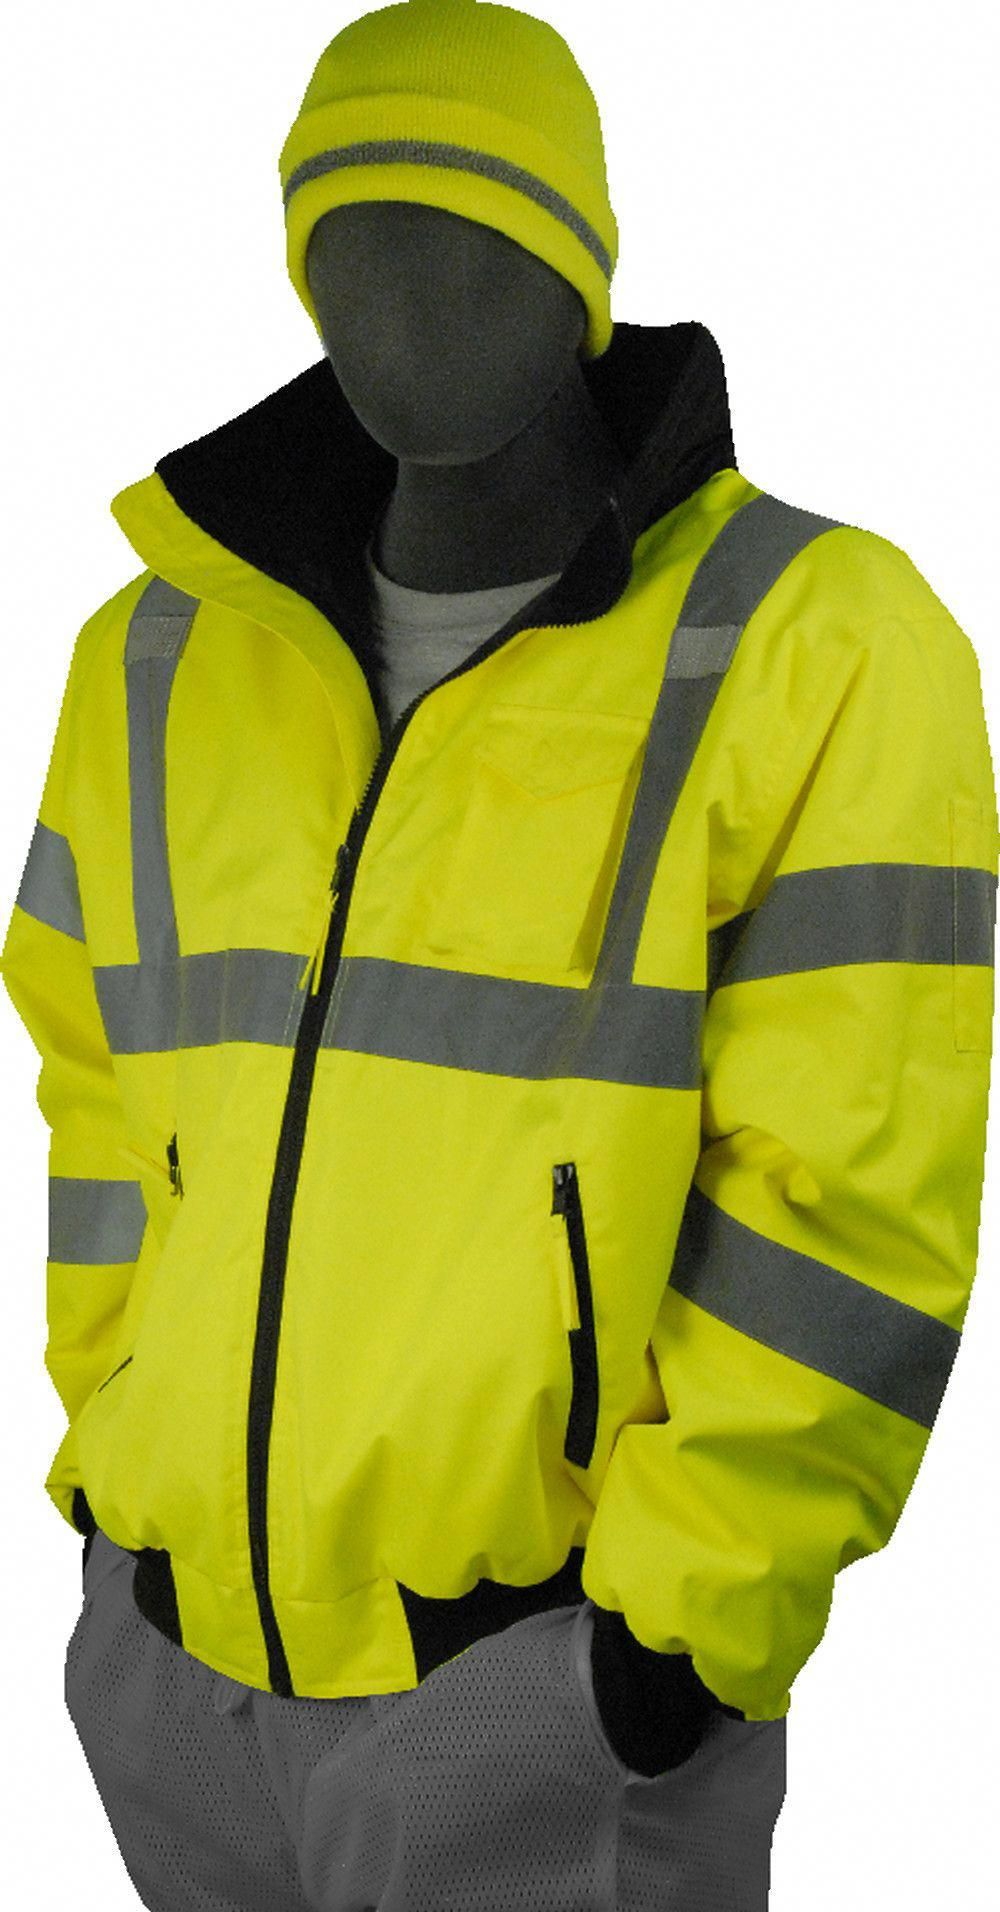 Majestic 75 1300 Hi Vis Yellow Bomber Jacket Ansi Class 3 Fixed Liner Womensraincoatclearance Jackets Bomber Jacket Raincoats For Women